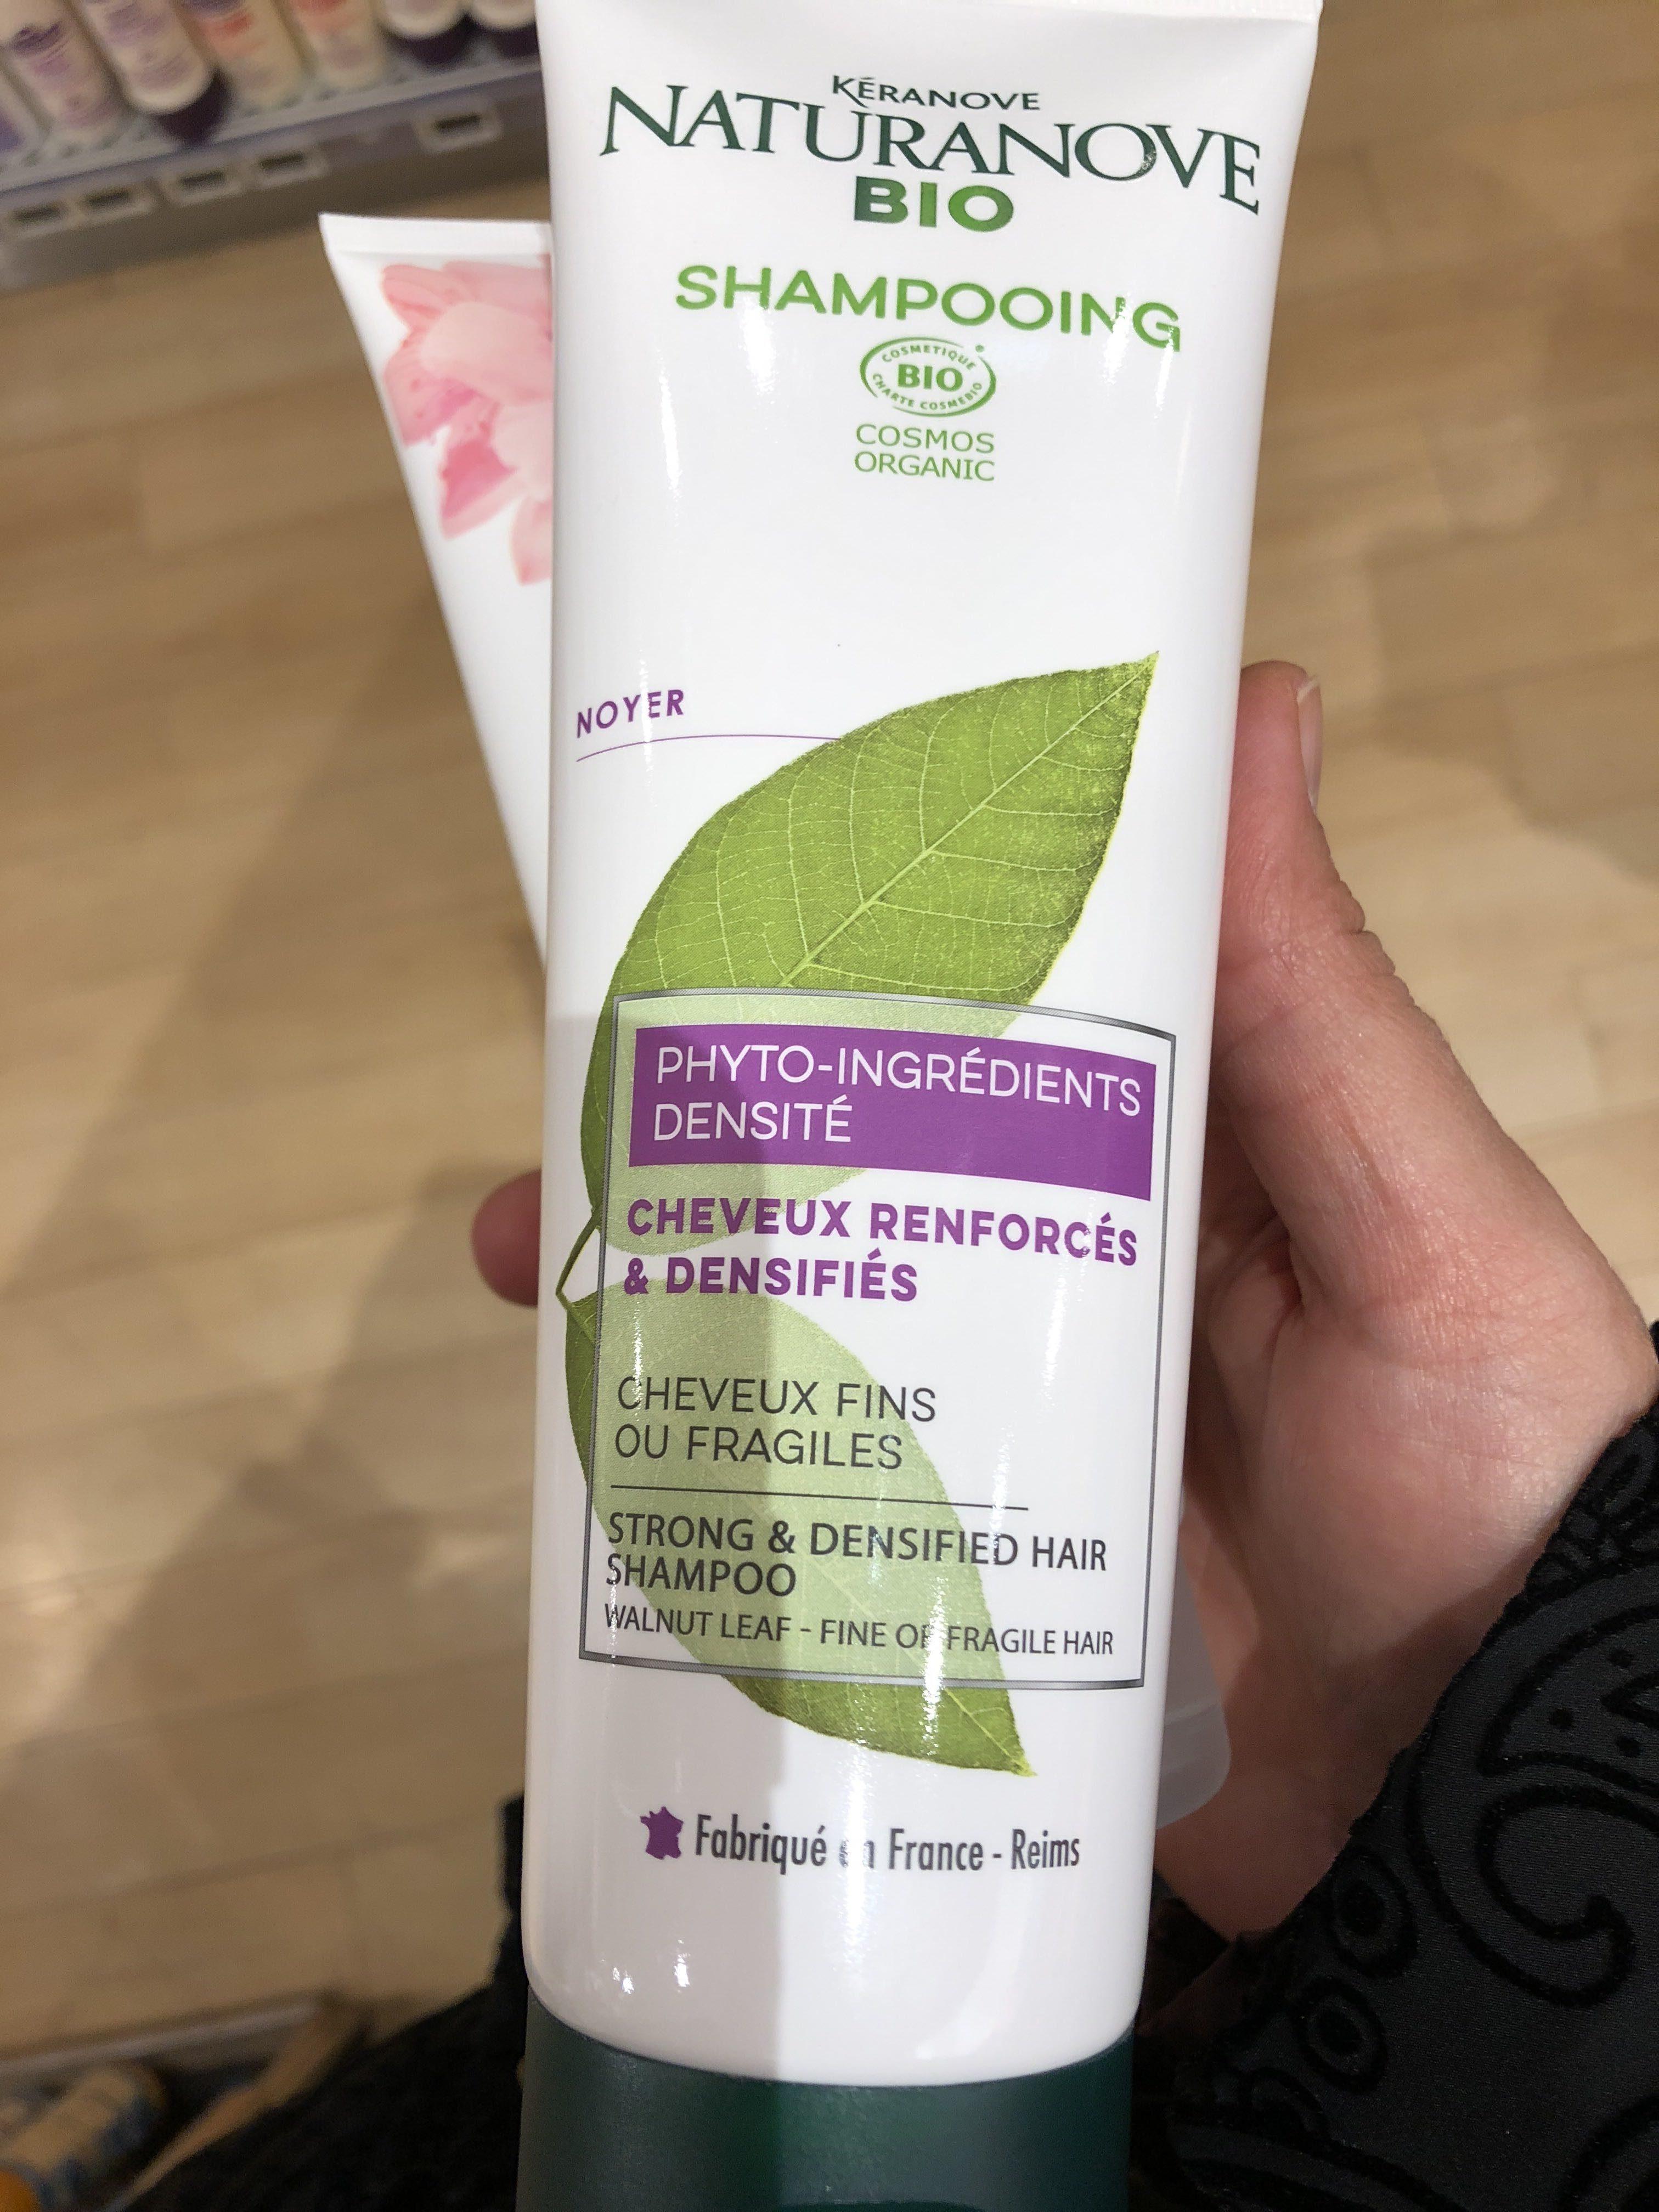 Naturanove Bio Shampooing - Product - fr